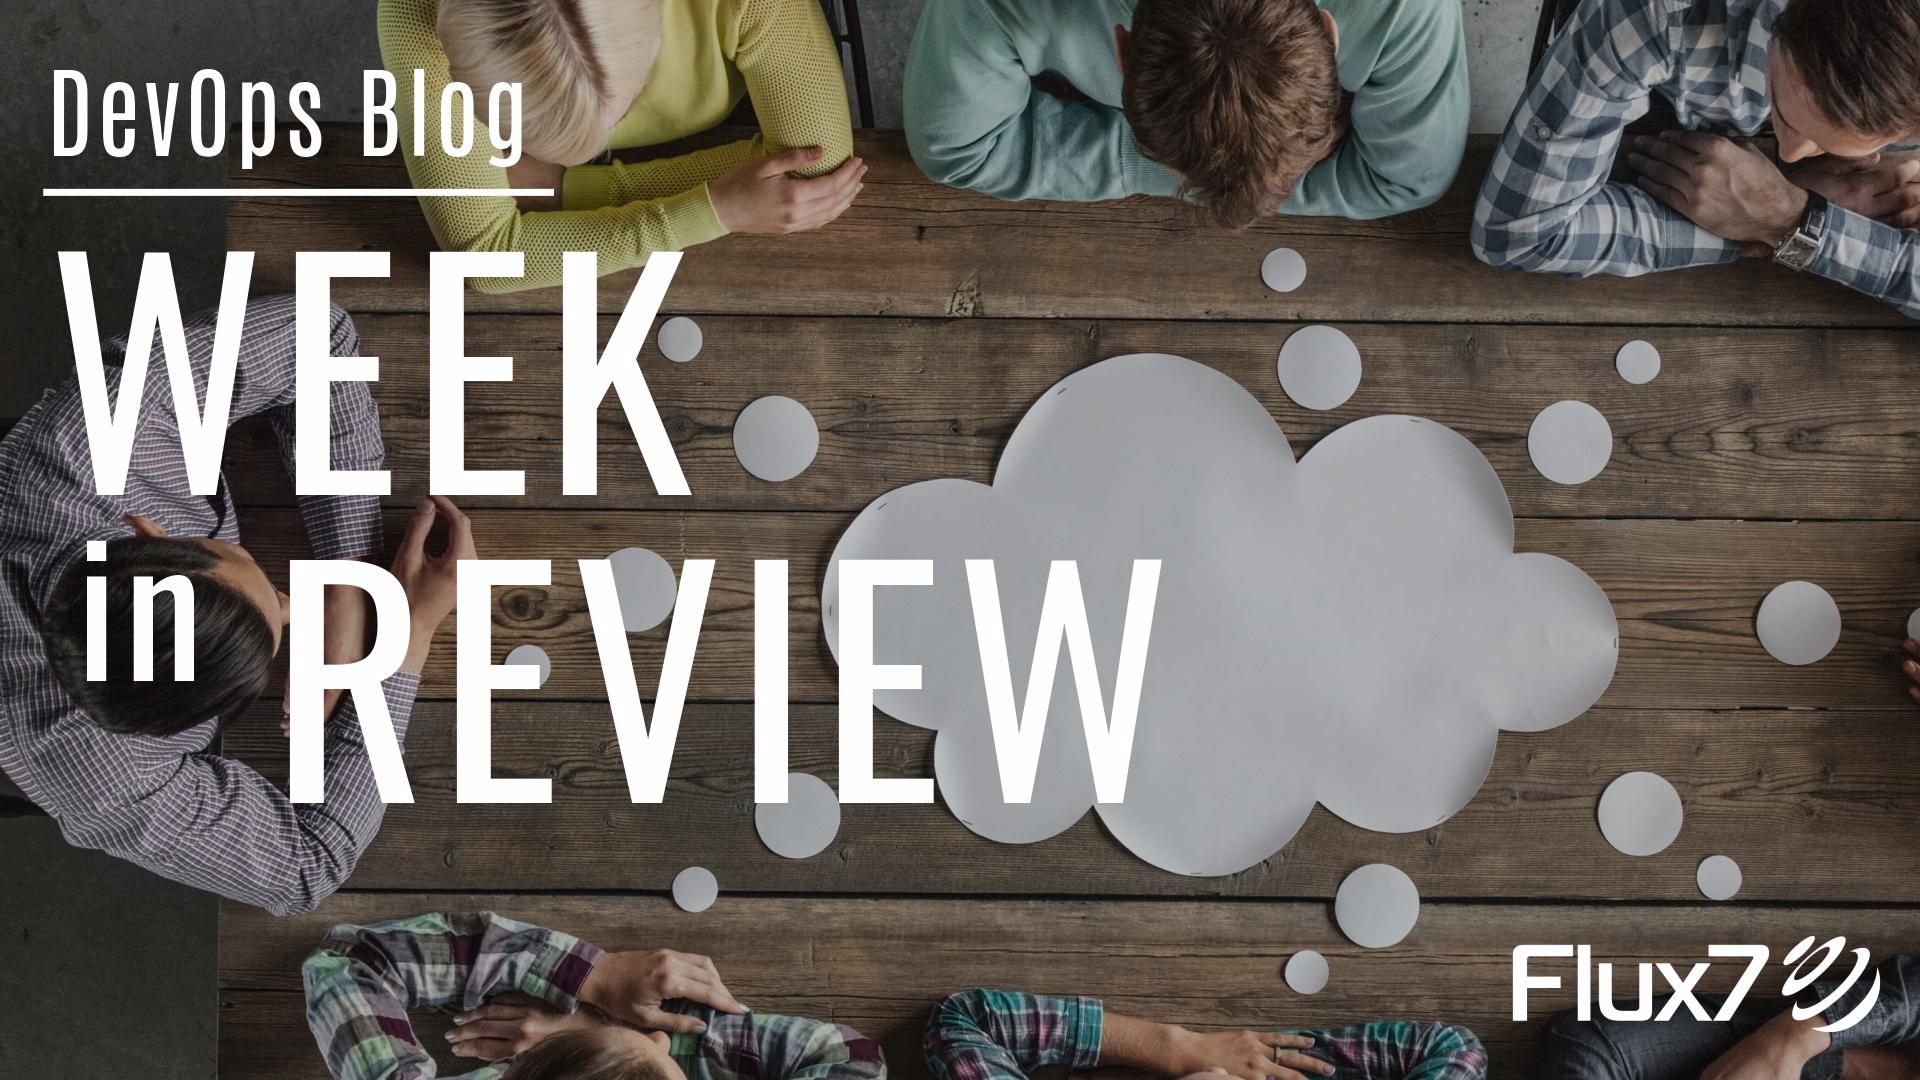 It Modernization And Devops News Week In Review Blog Clouds New Week